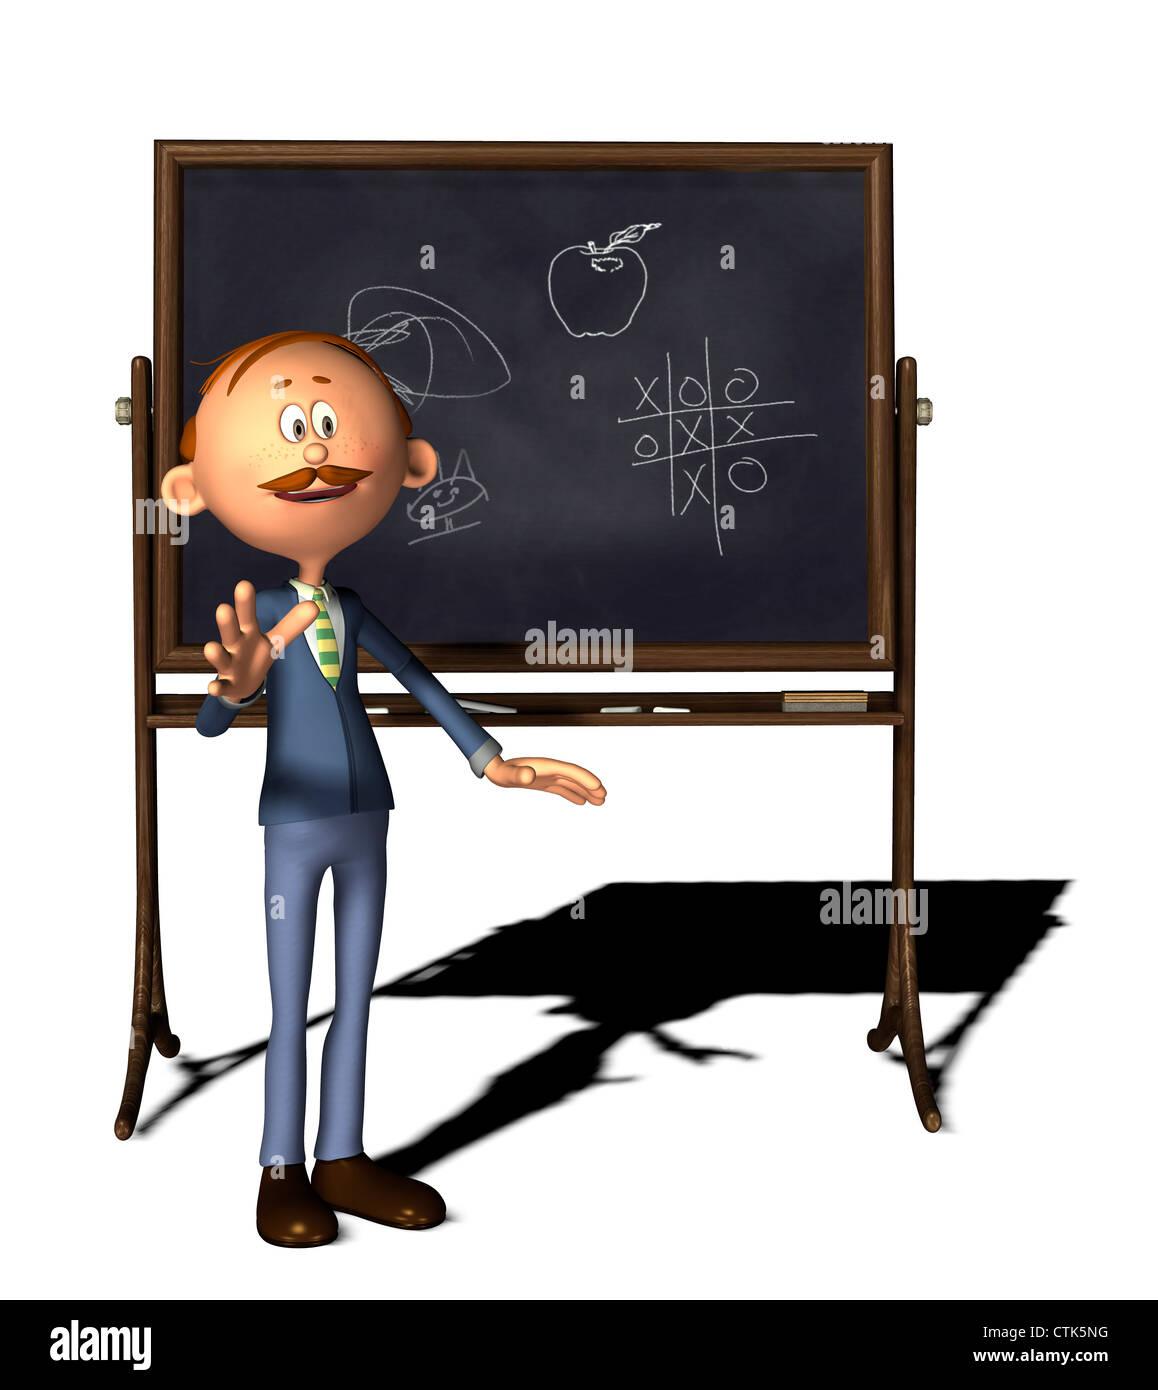 Cartoon-Figur-Lehrer mit boardStockfoto